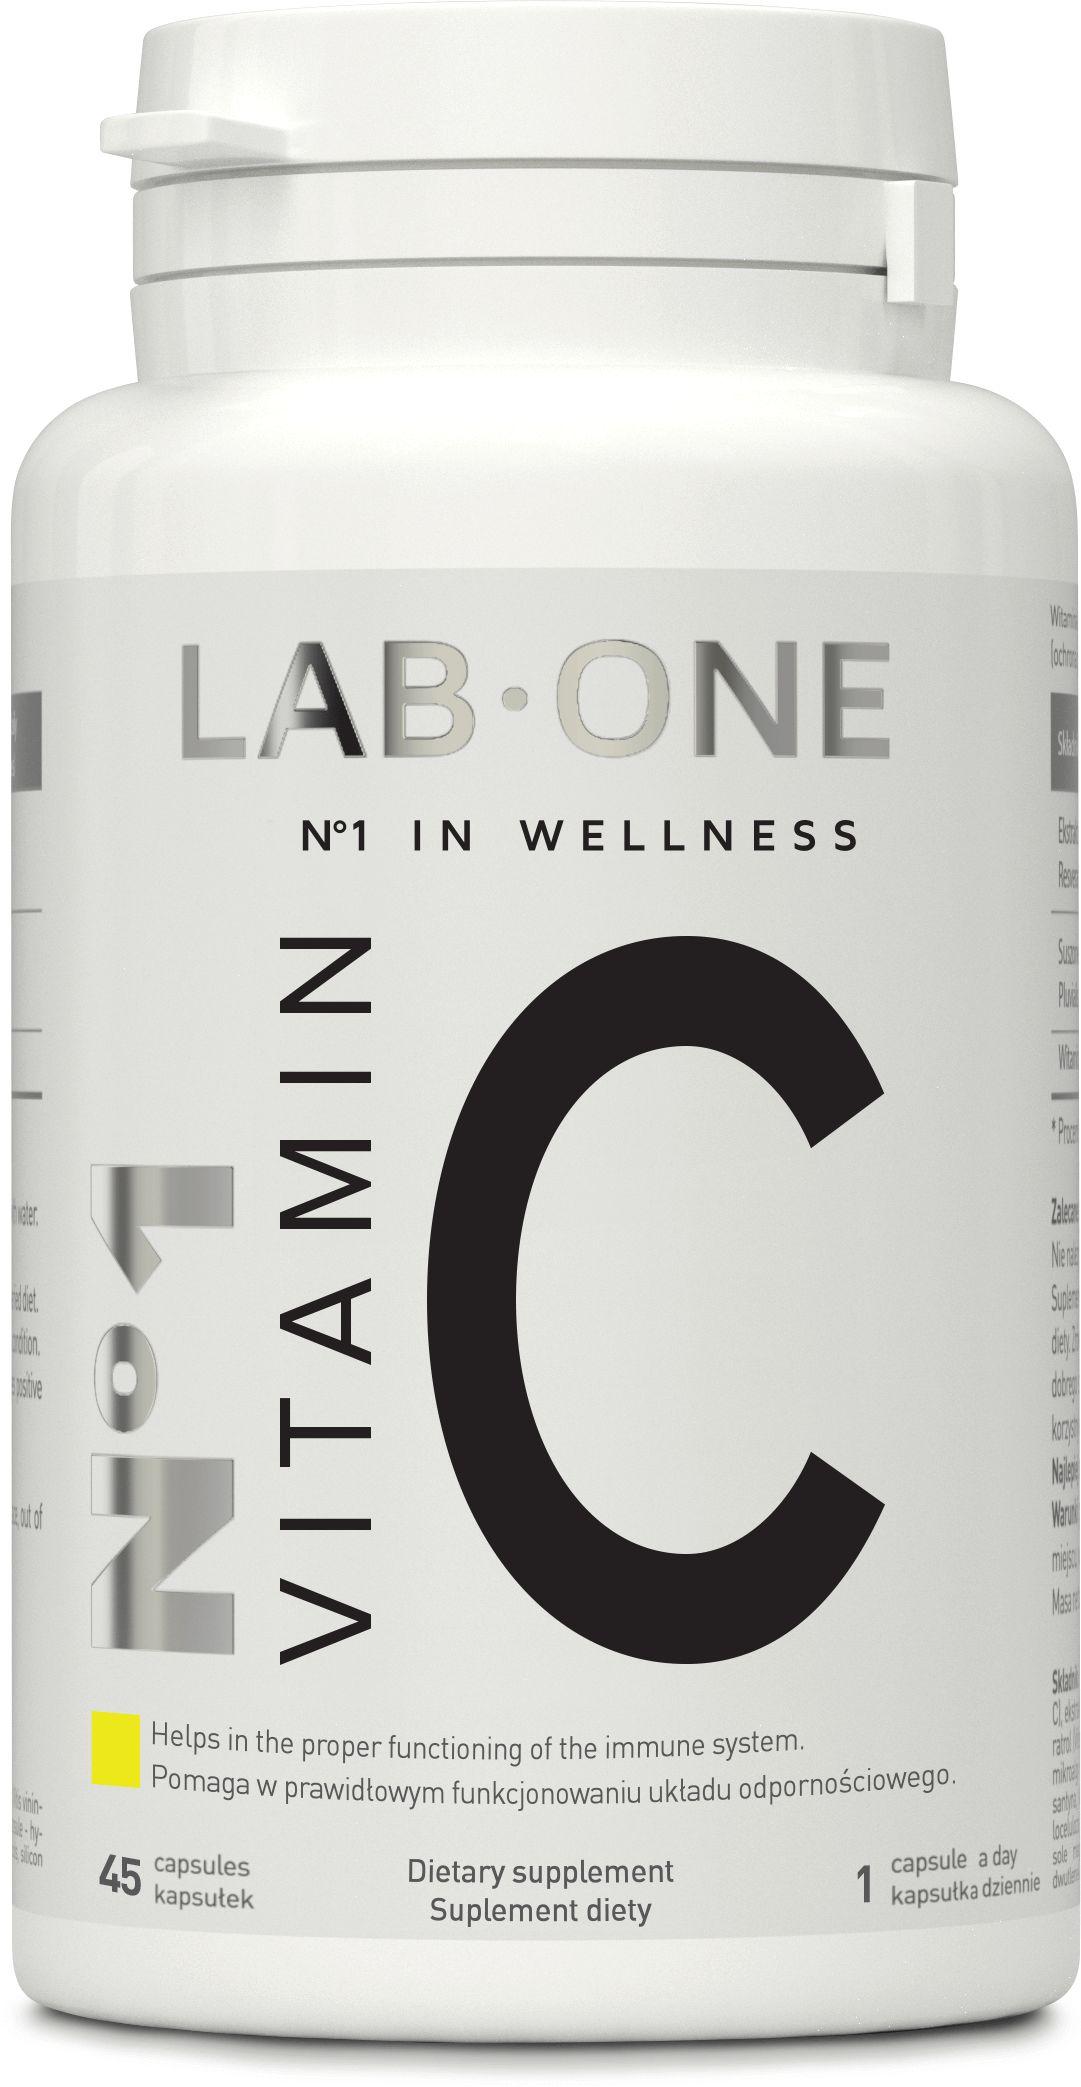 LAB ONE N1 Vitamin C (Witamina C, Odporność) 1000mg 45 Kapsułek